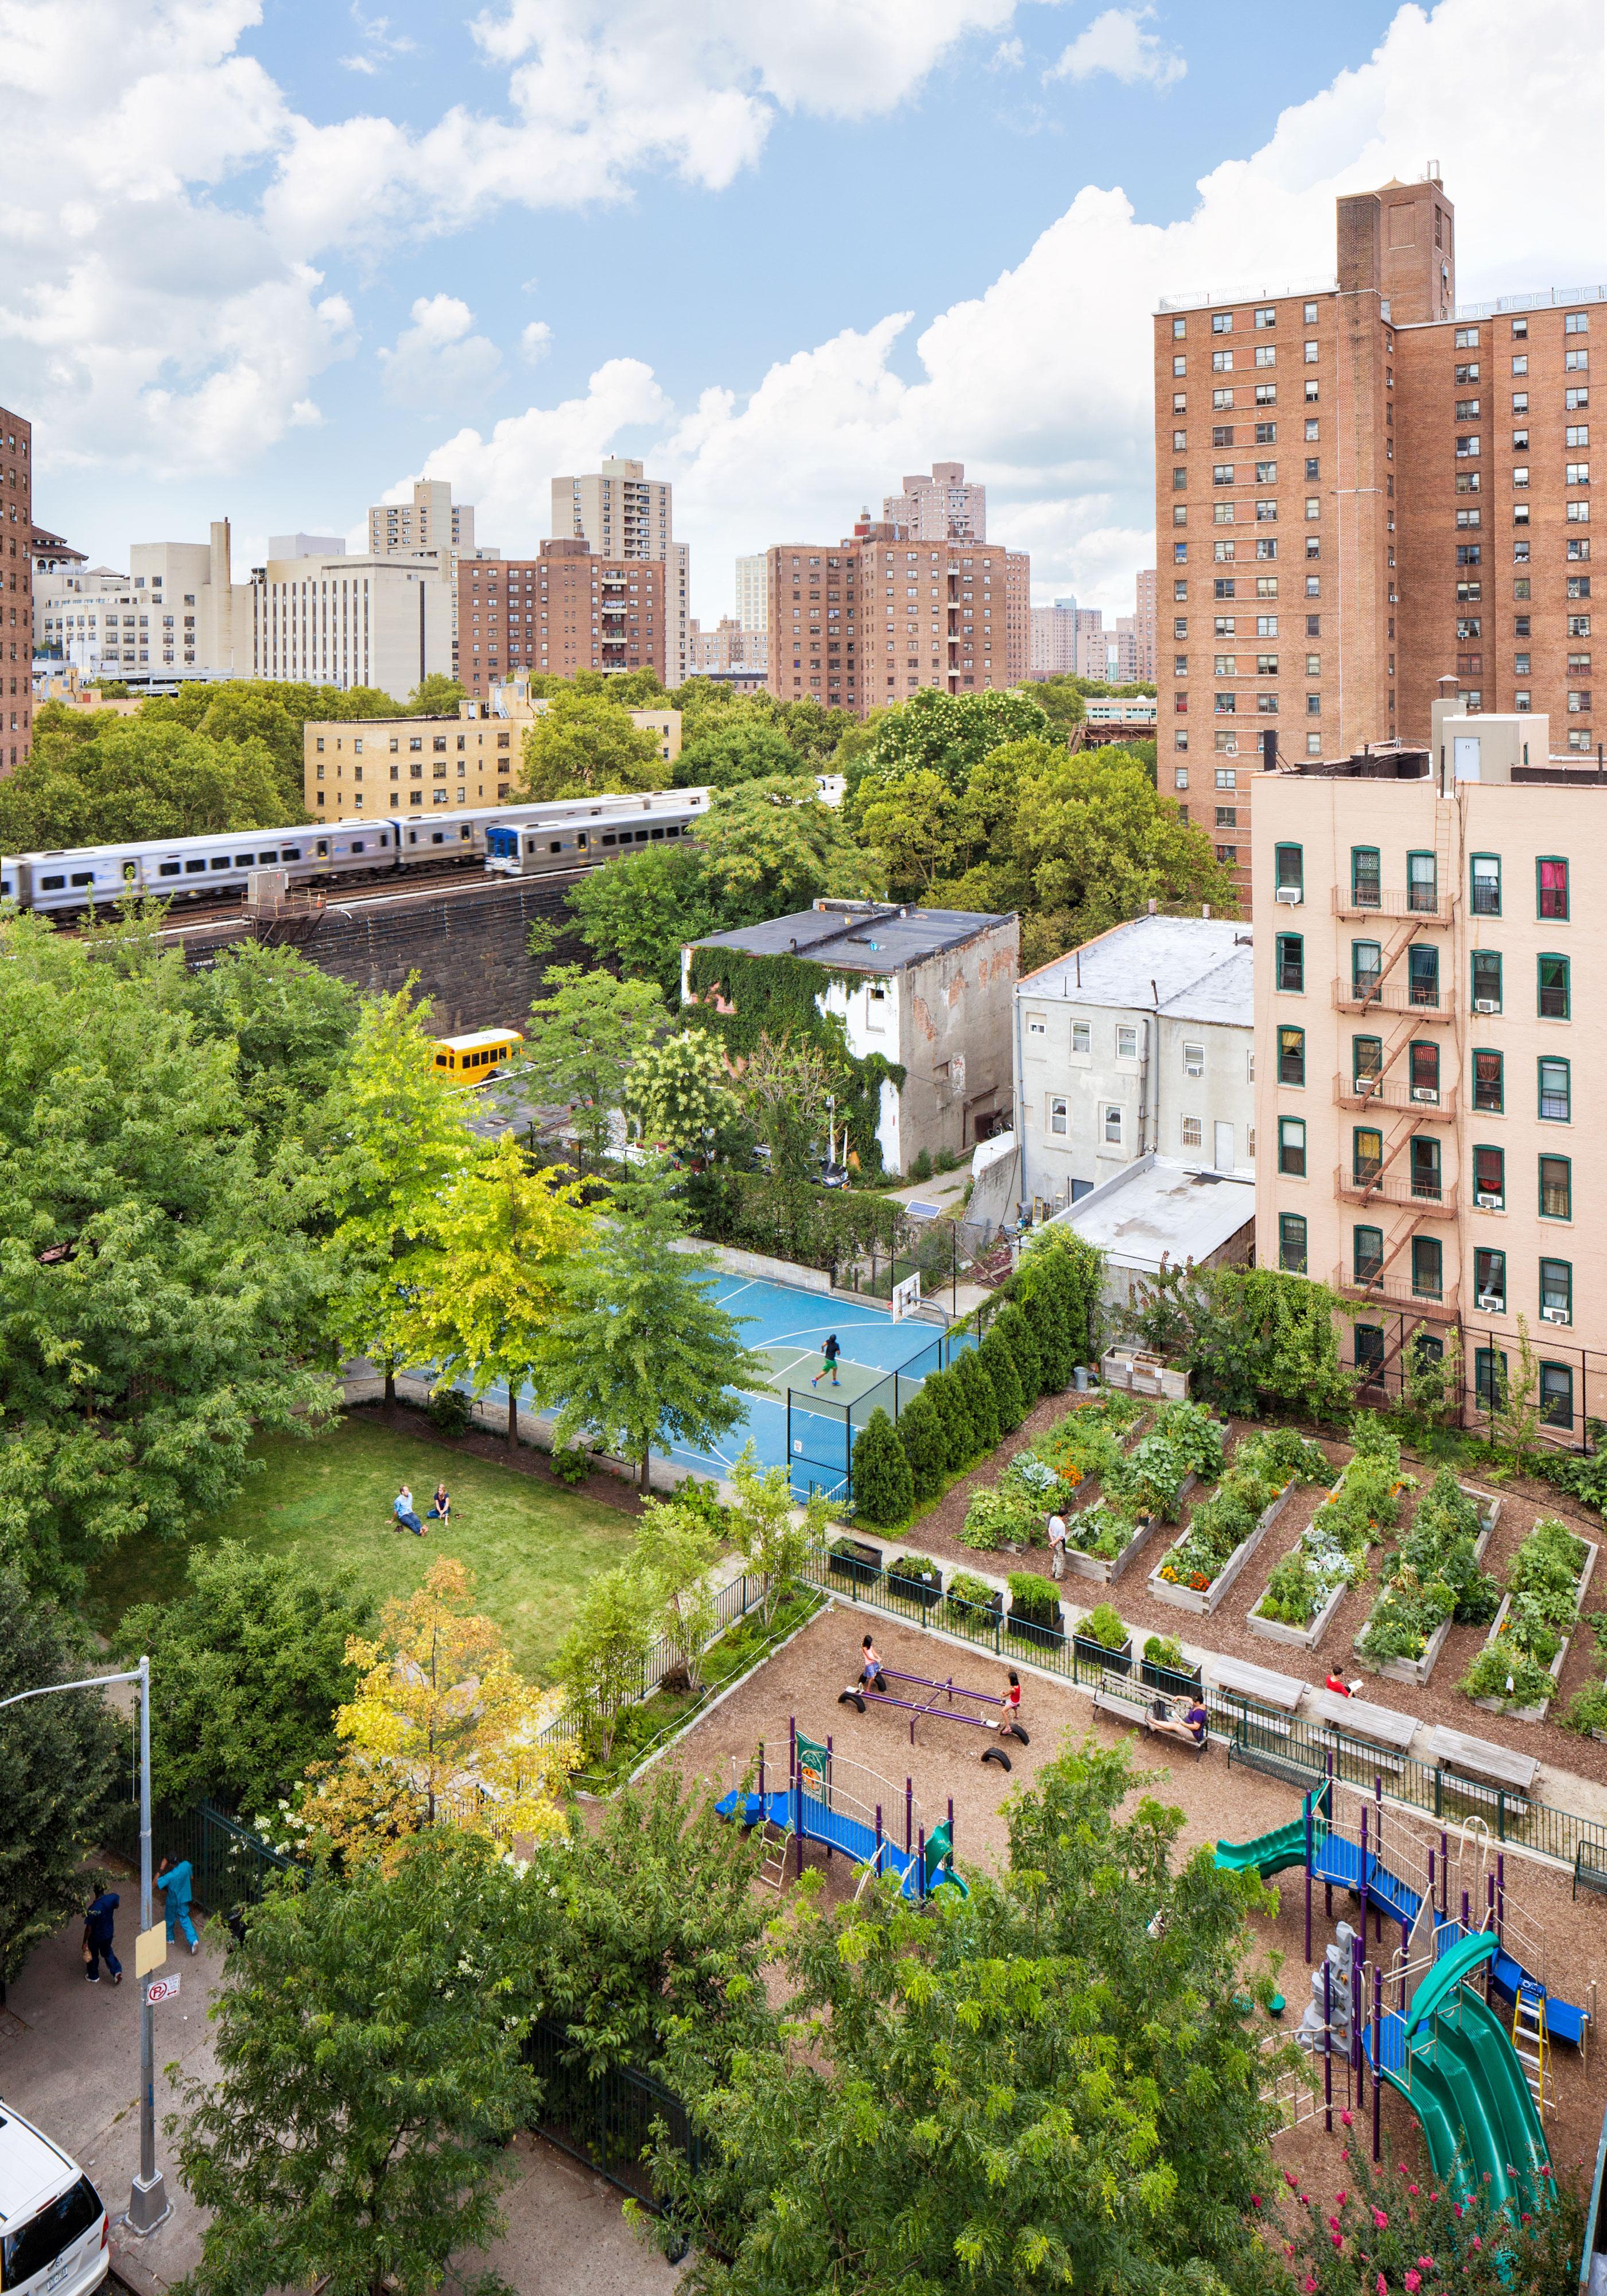 103rd Street Community Garden Scape